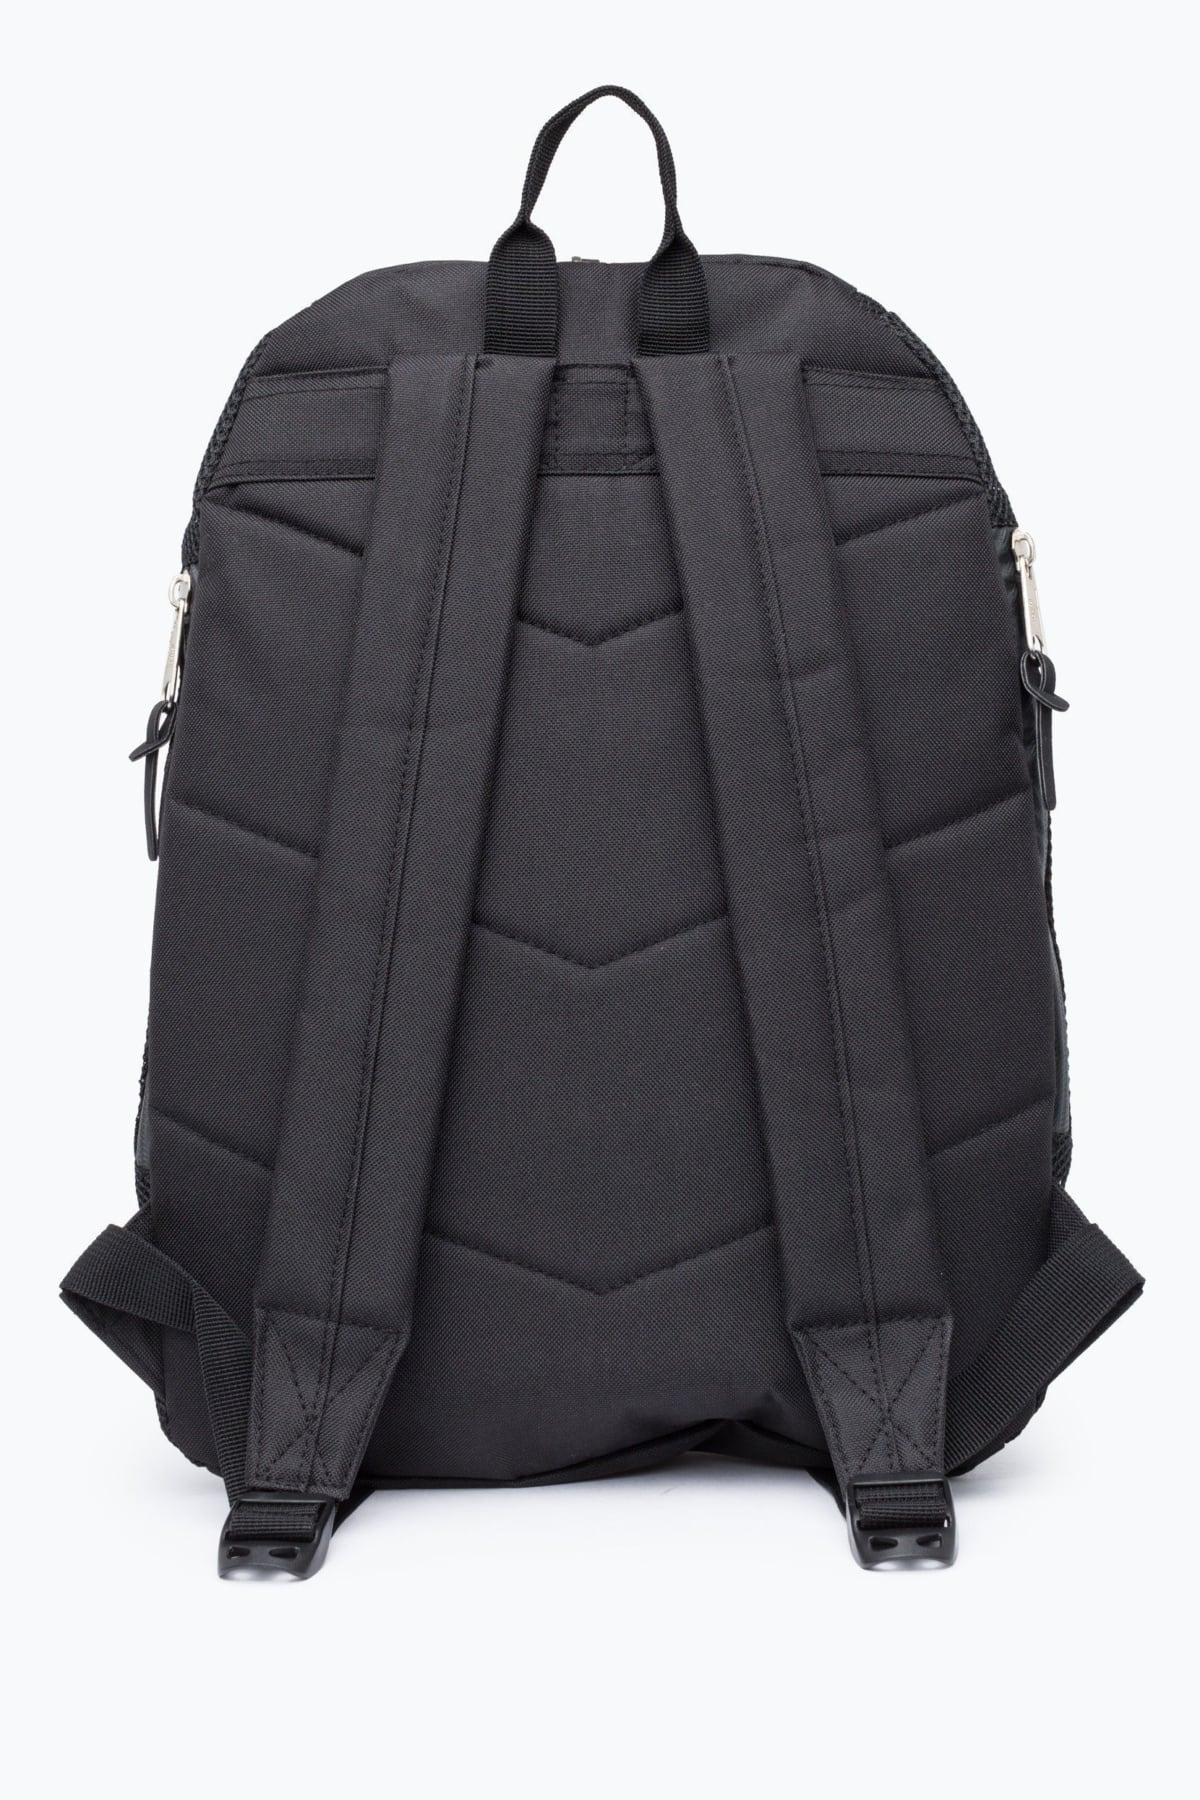 HYPE Black/White Mesh Backpack Sports